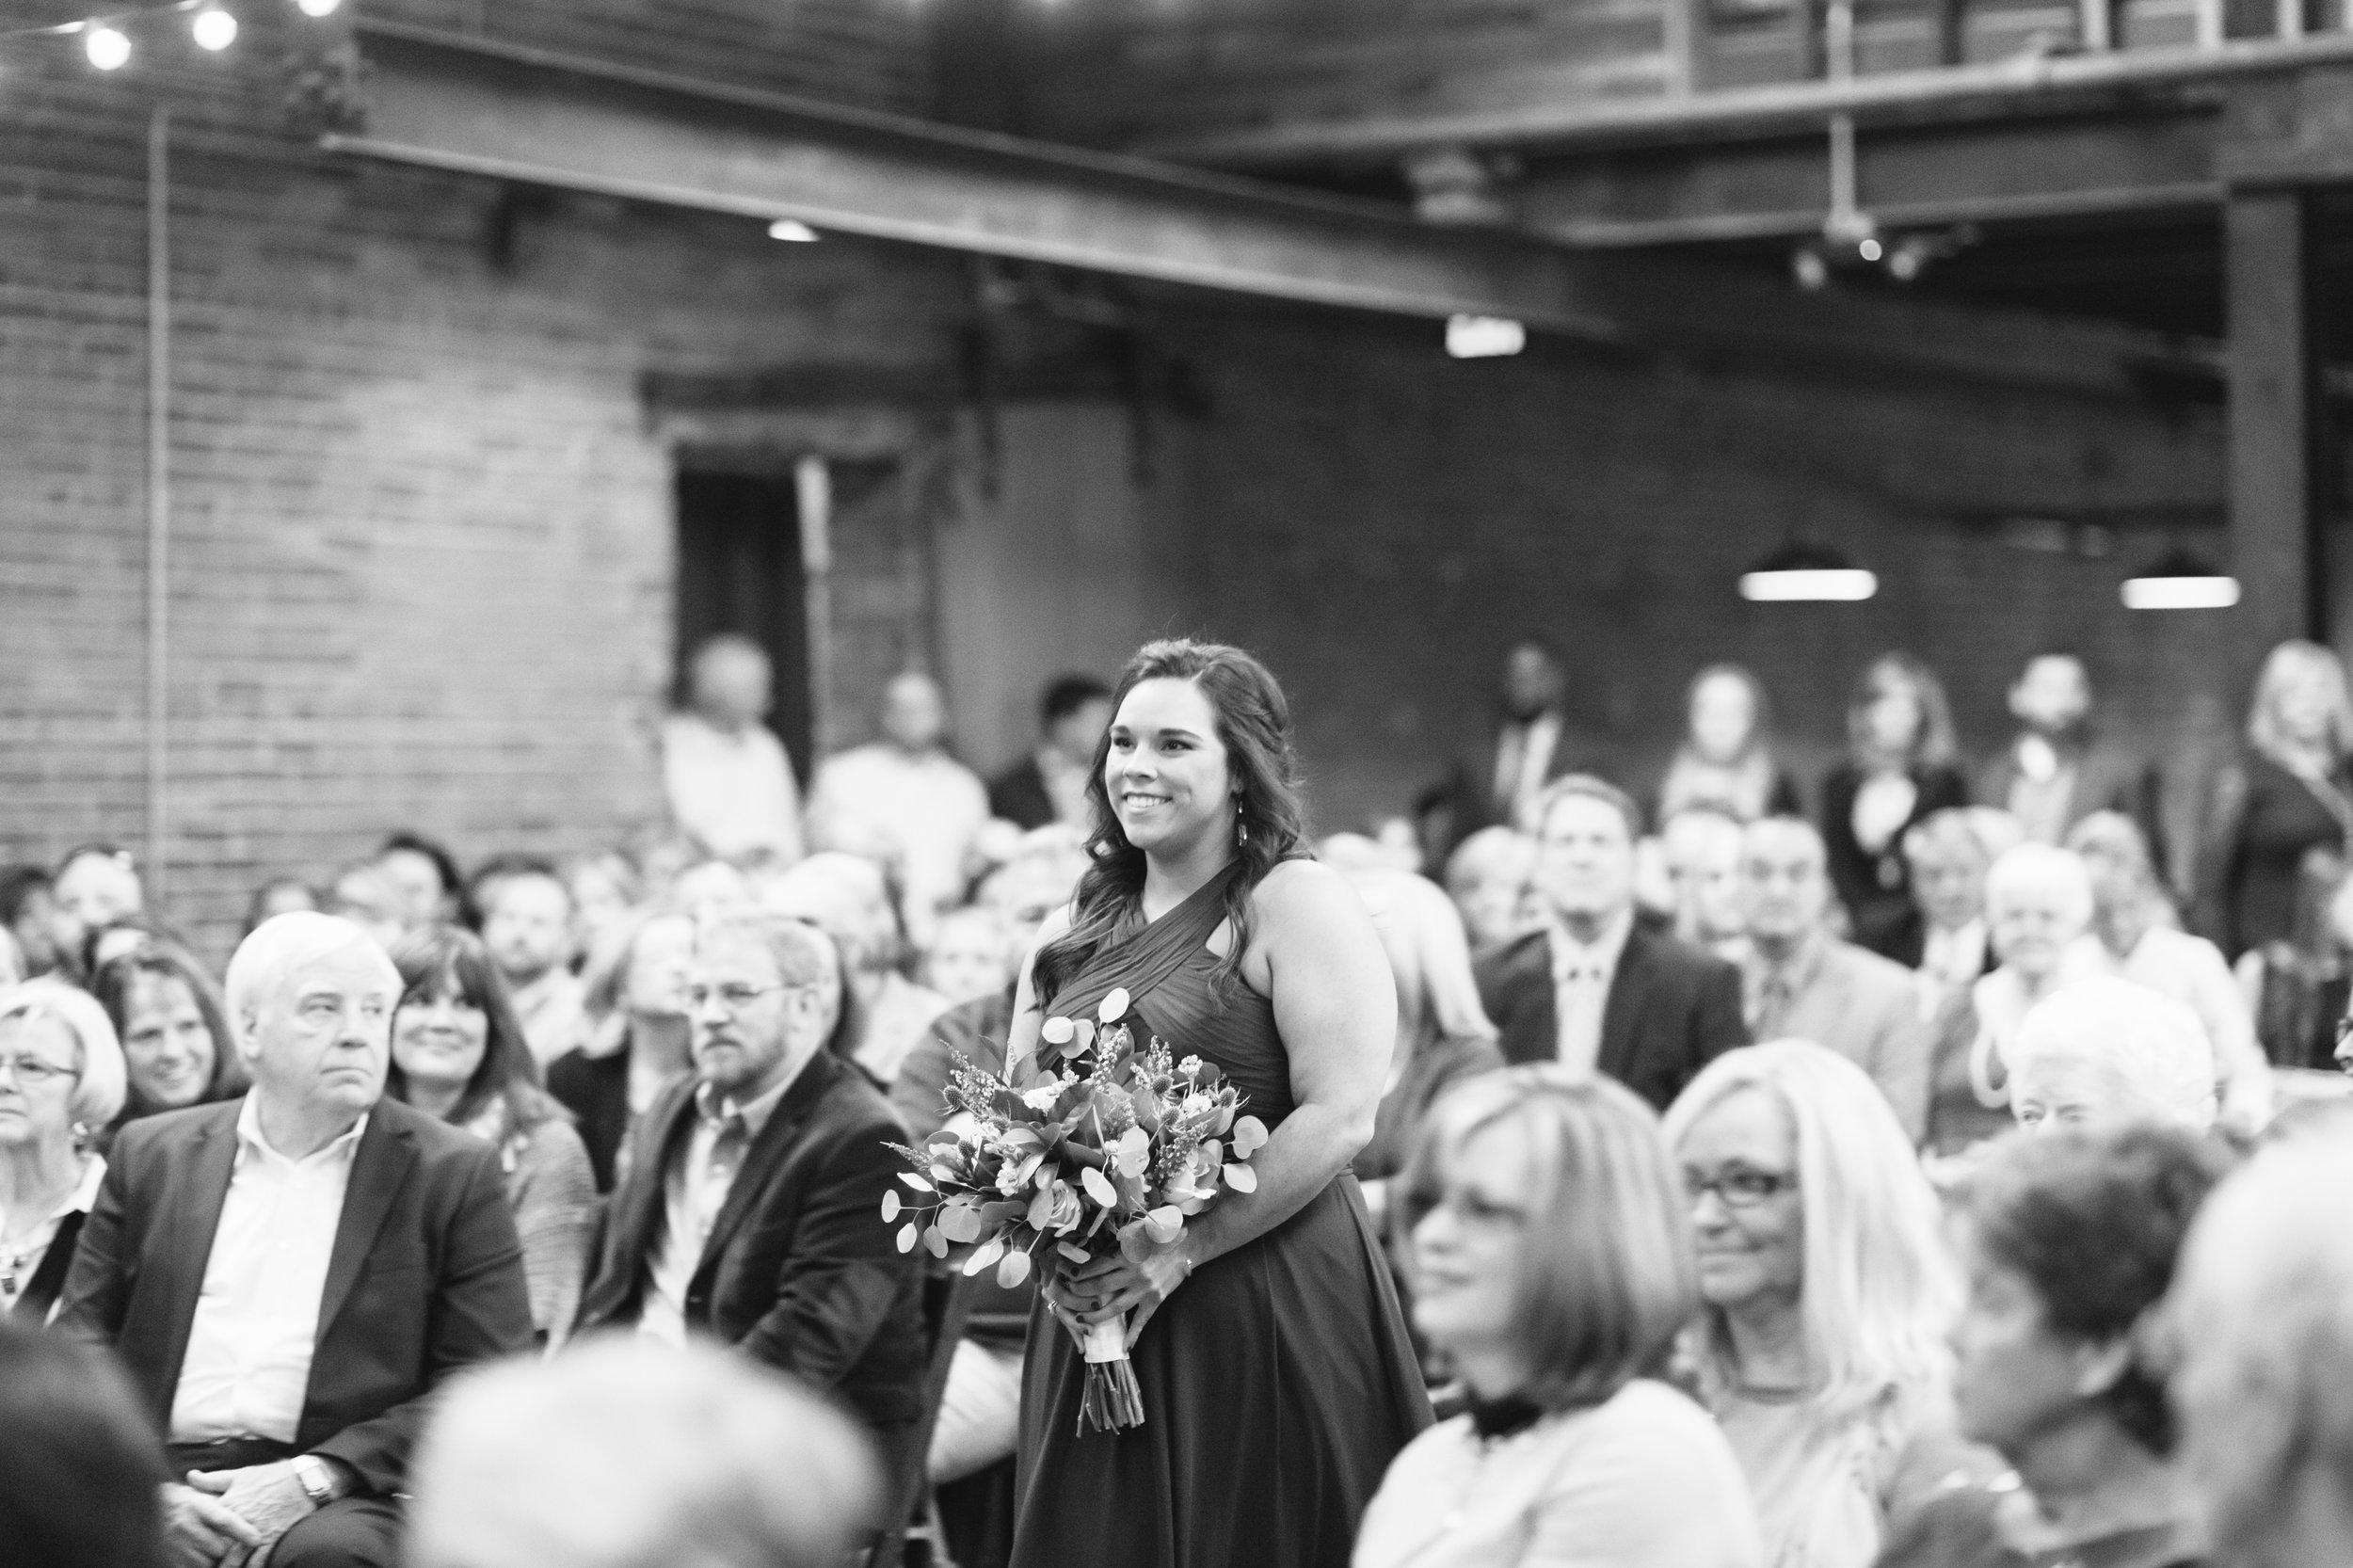 Lauren_Jeremy_Standard_Wedding_Knoxville_Abigail_Malone_Photography_FIlm-453.jpg